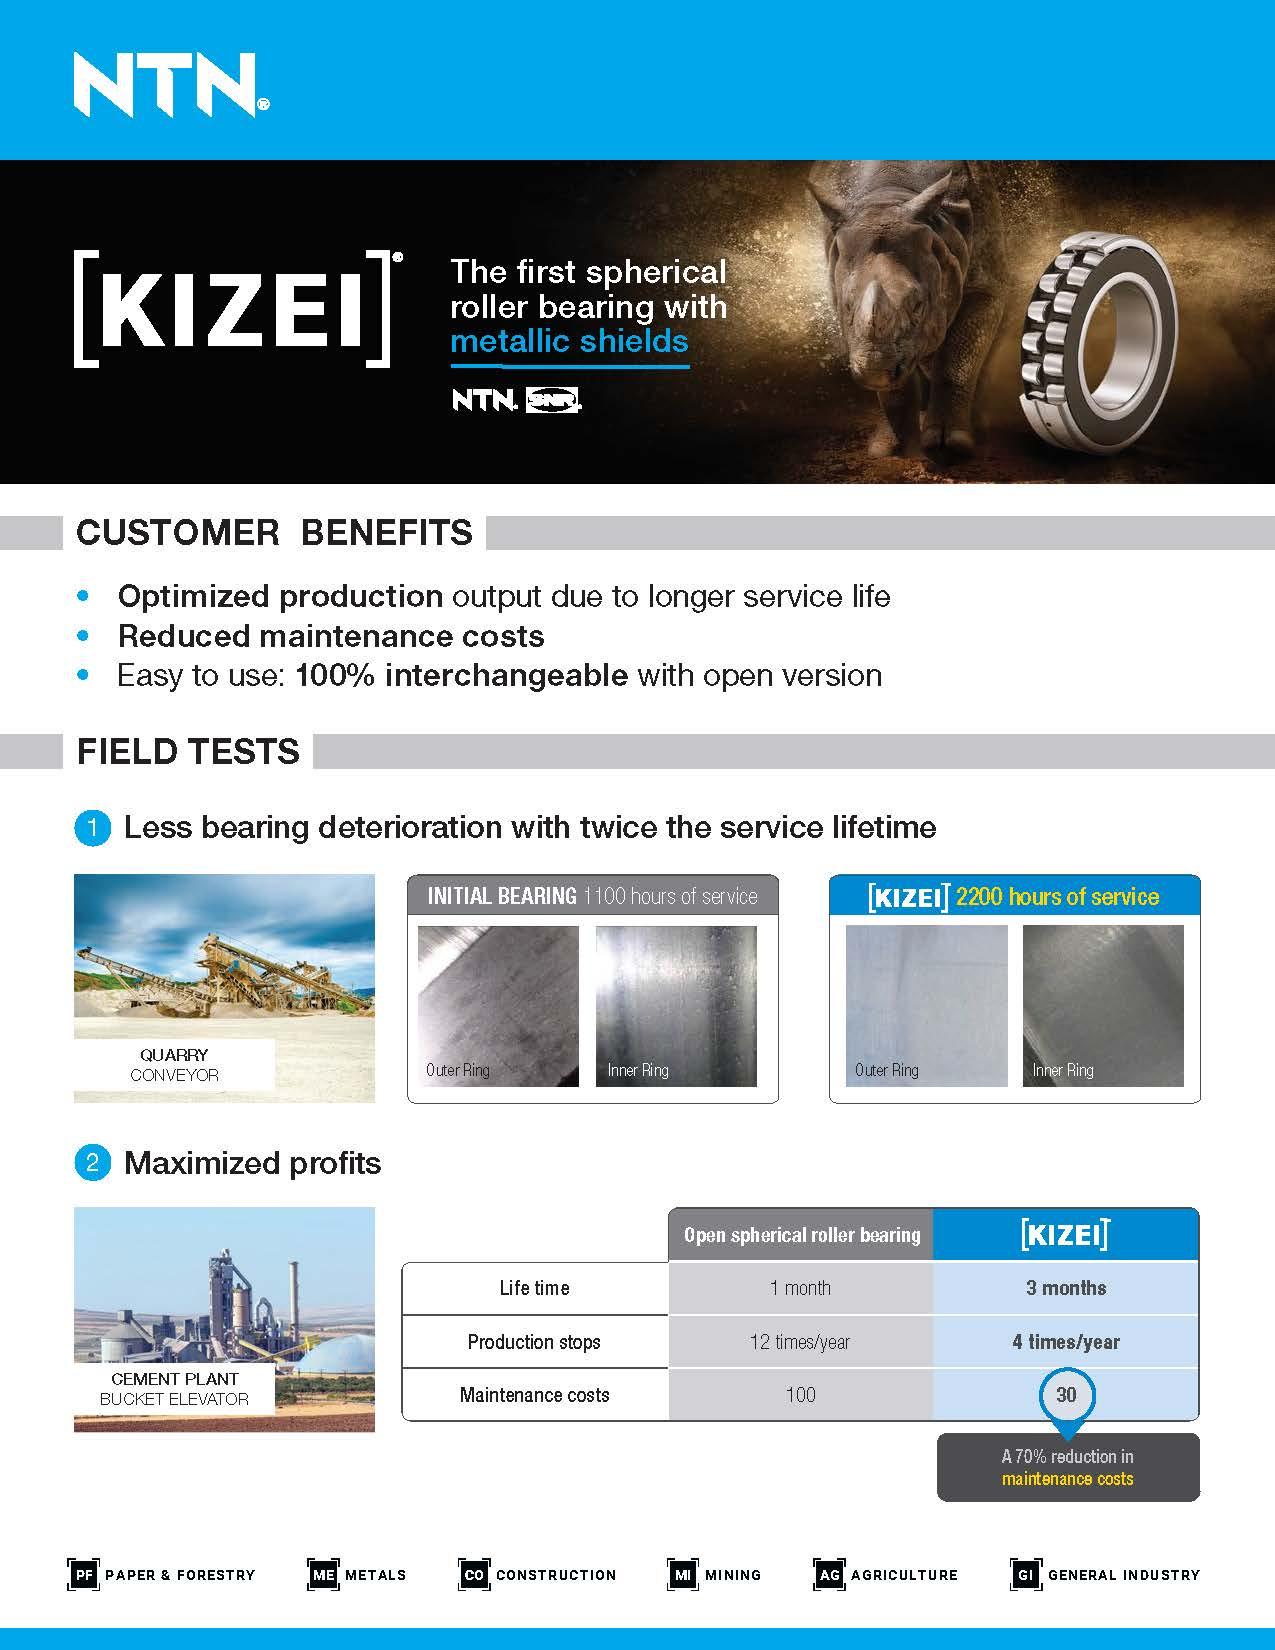 KIZEI https://ntn.ca/wp content/uploads///NTN KIZEI Spherical Roller Bearing Quick Reference Guide.pdf